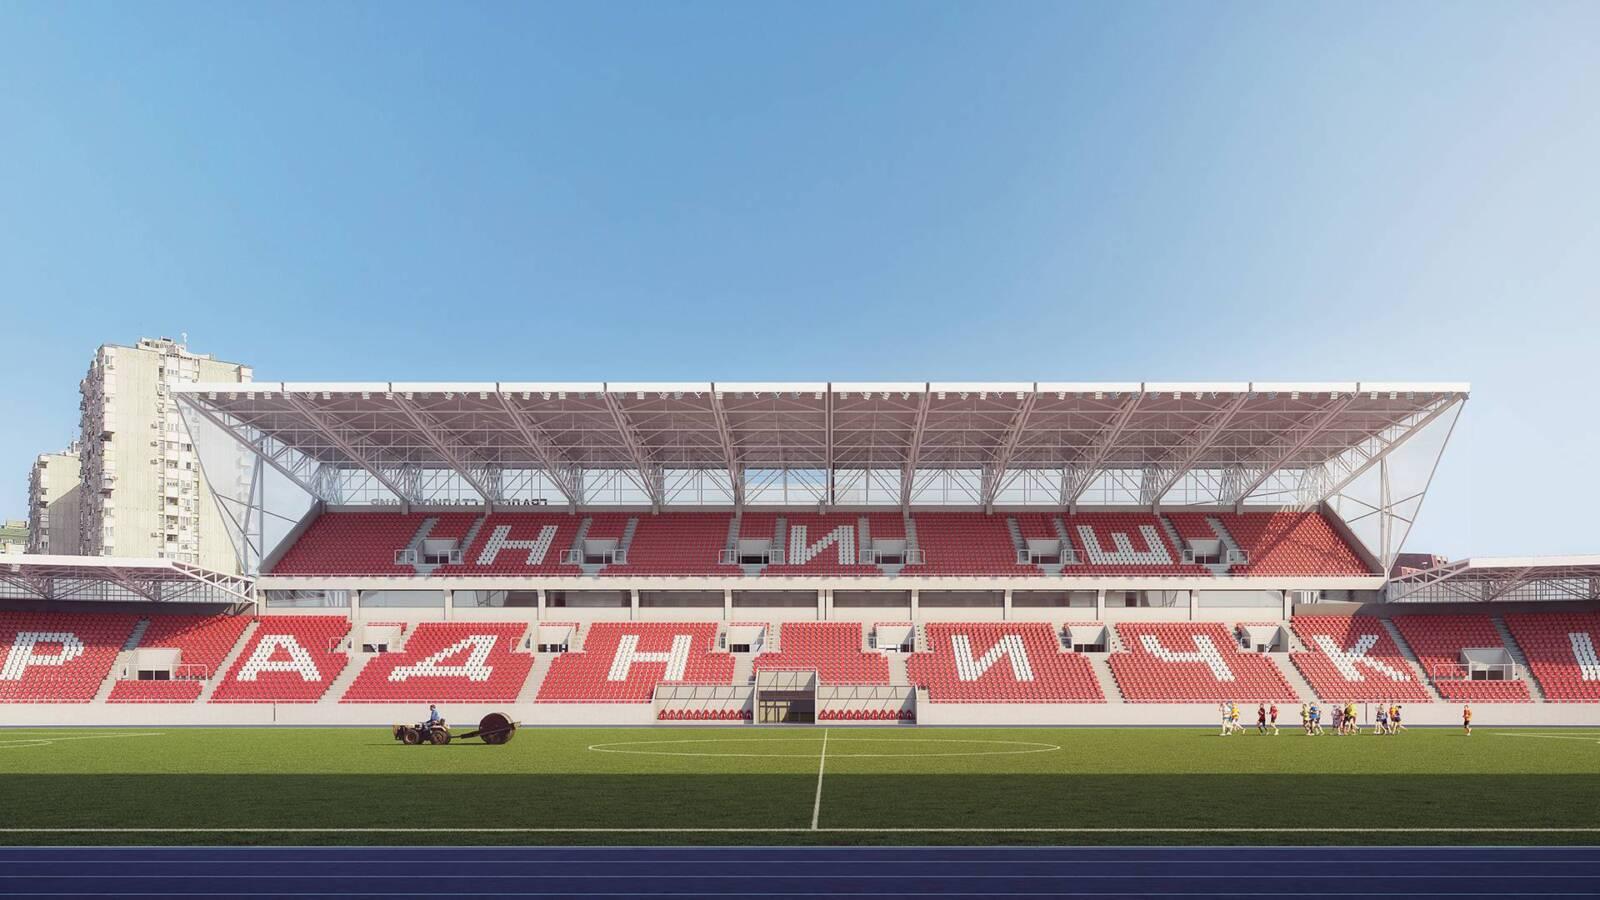 Stadion-Cair-Nis-Kapaprojekt-2